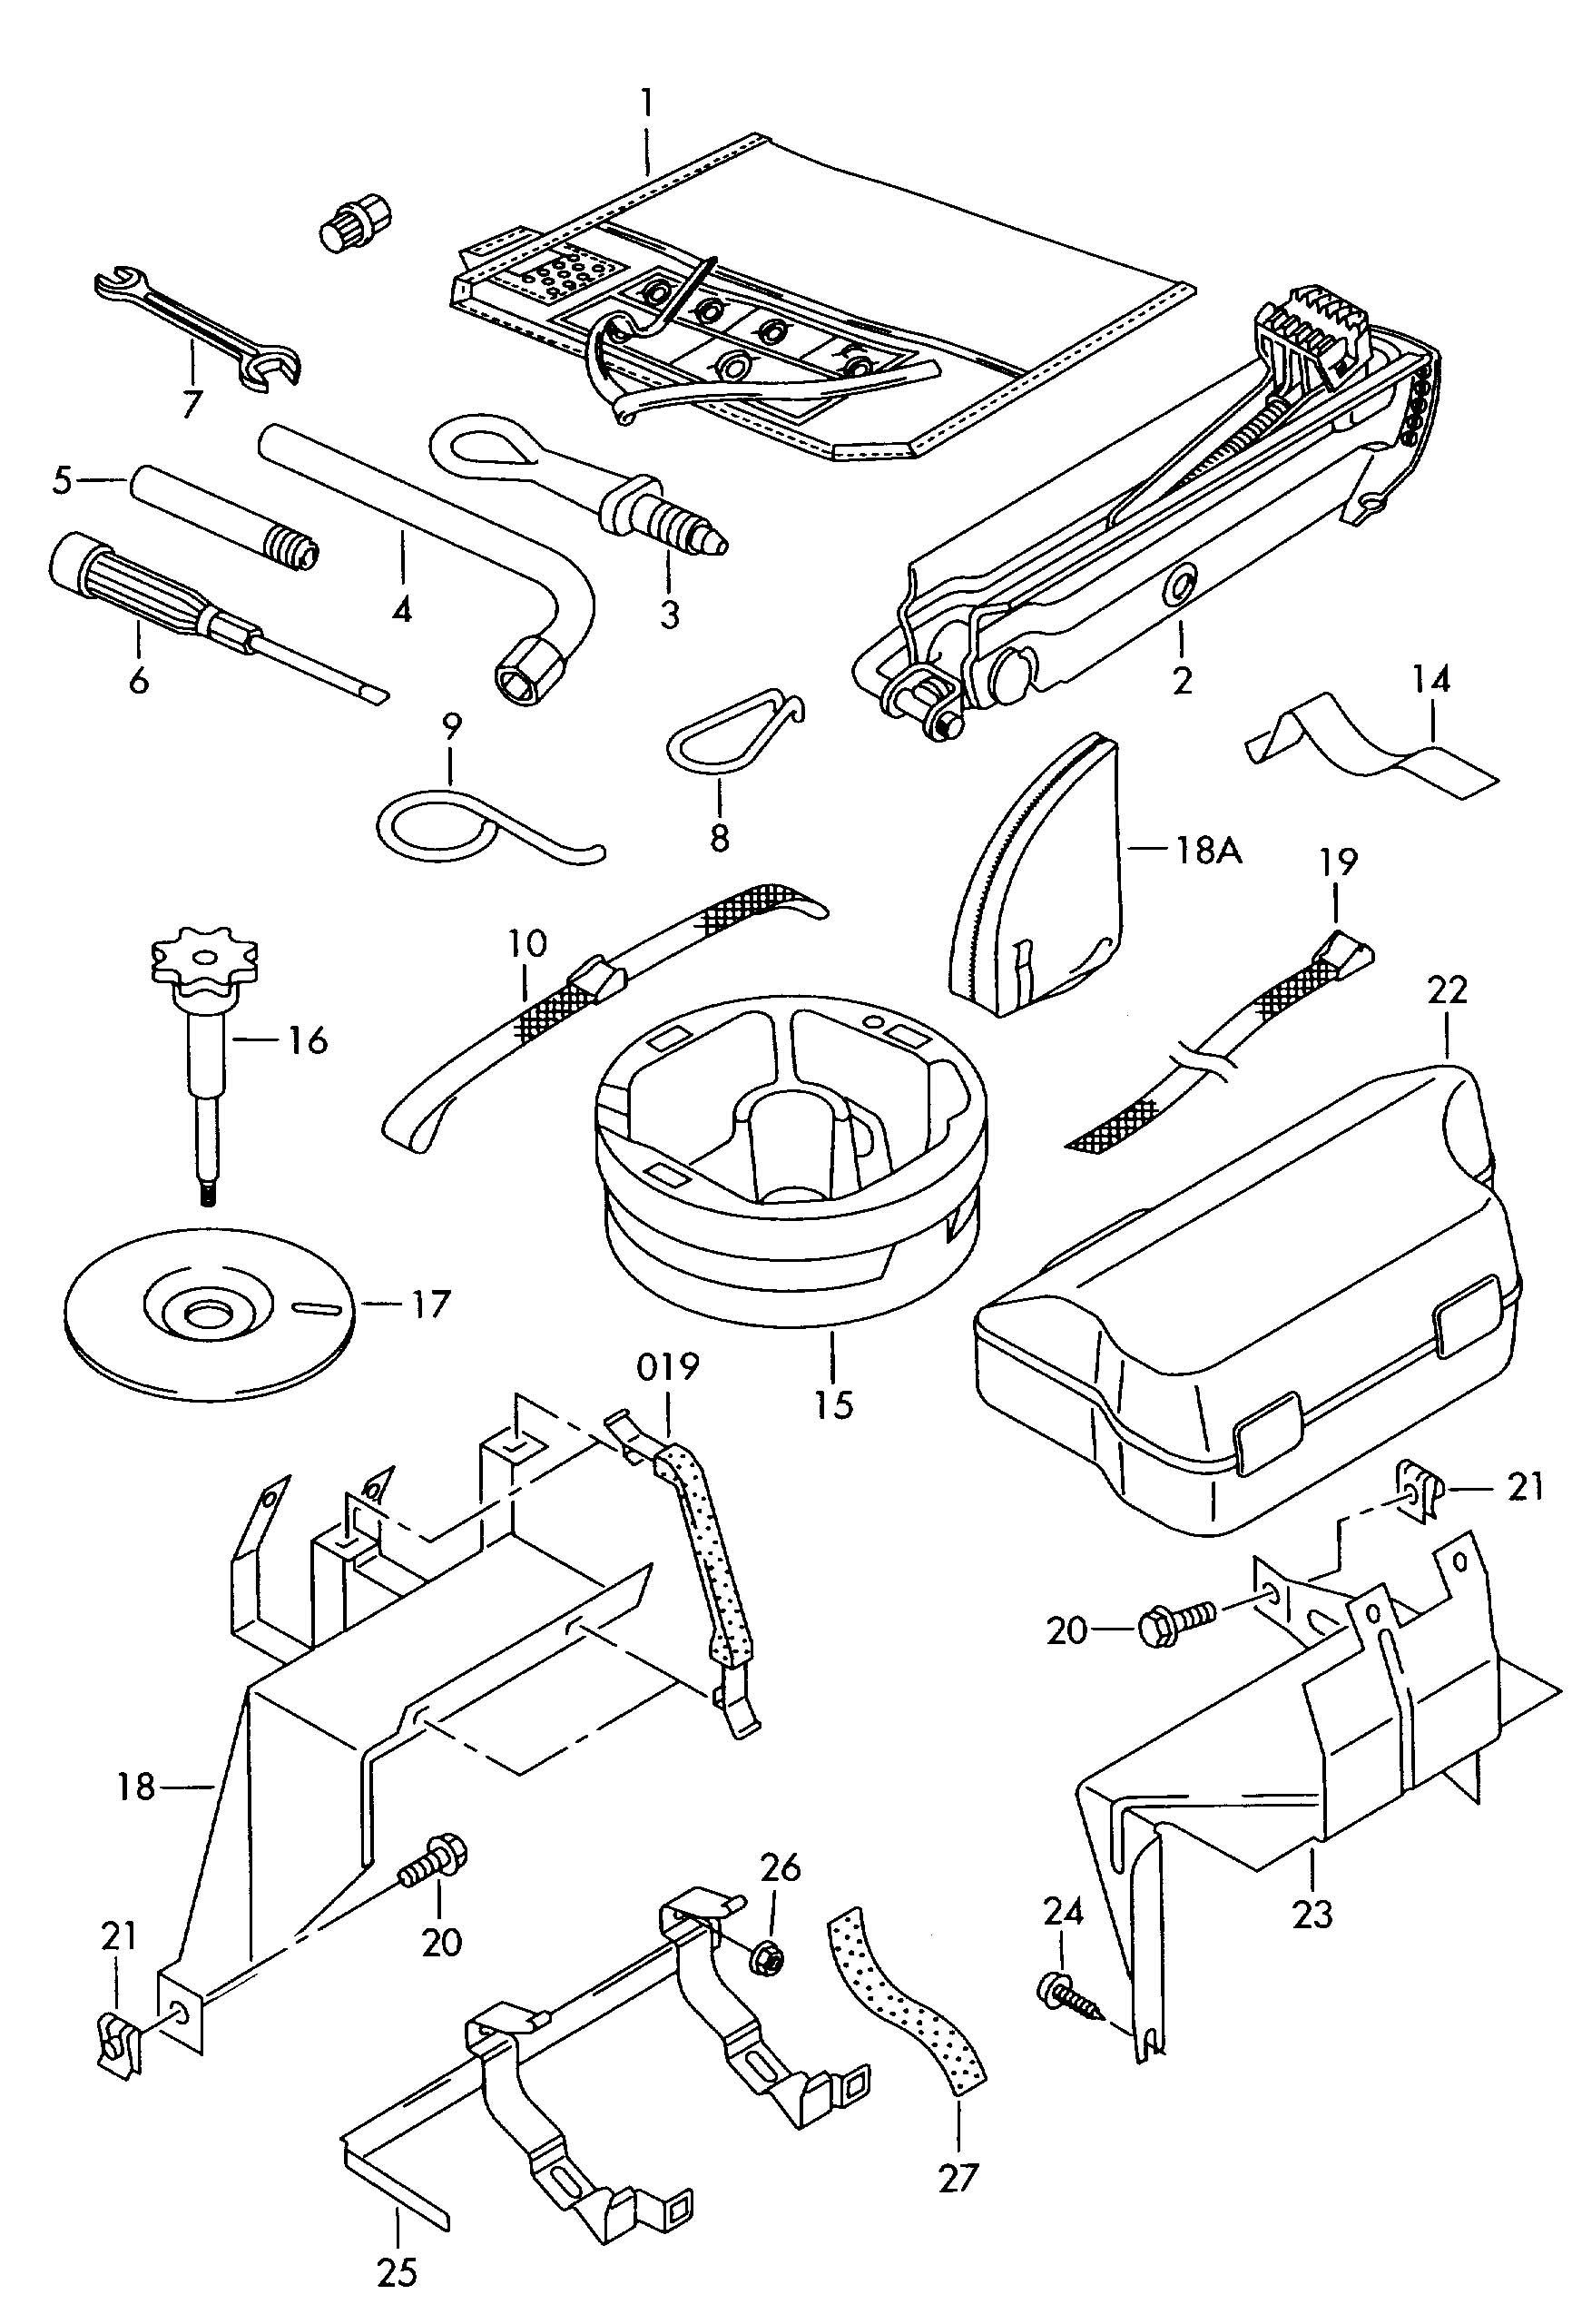 Volkswagen Passat Jack Cast Extinguisher Unitsplatform